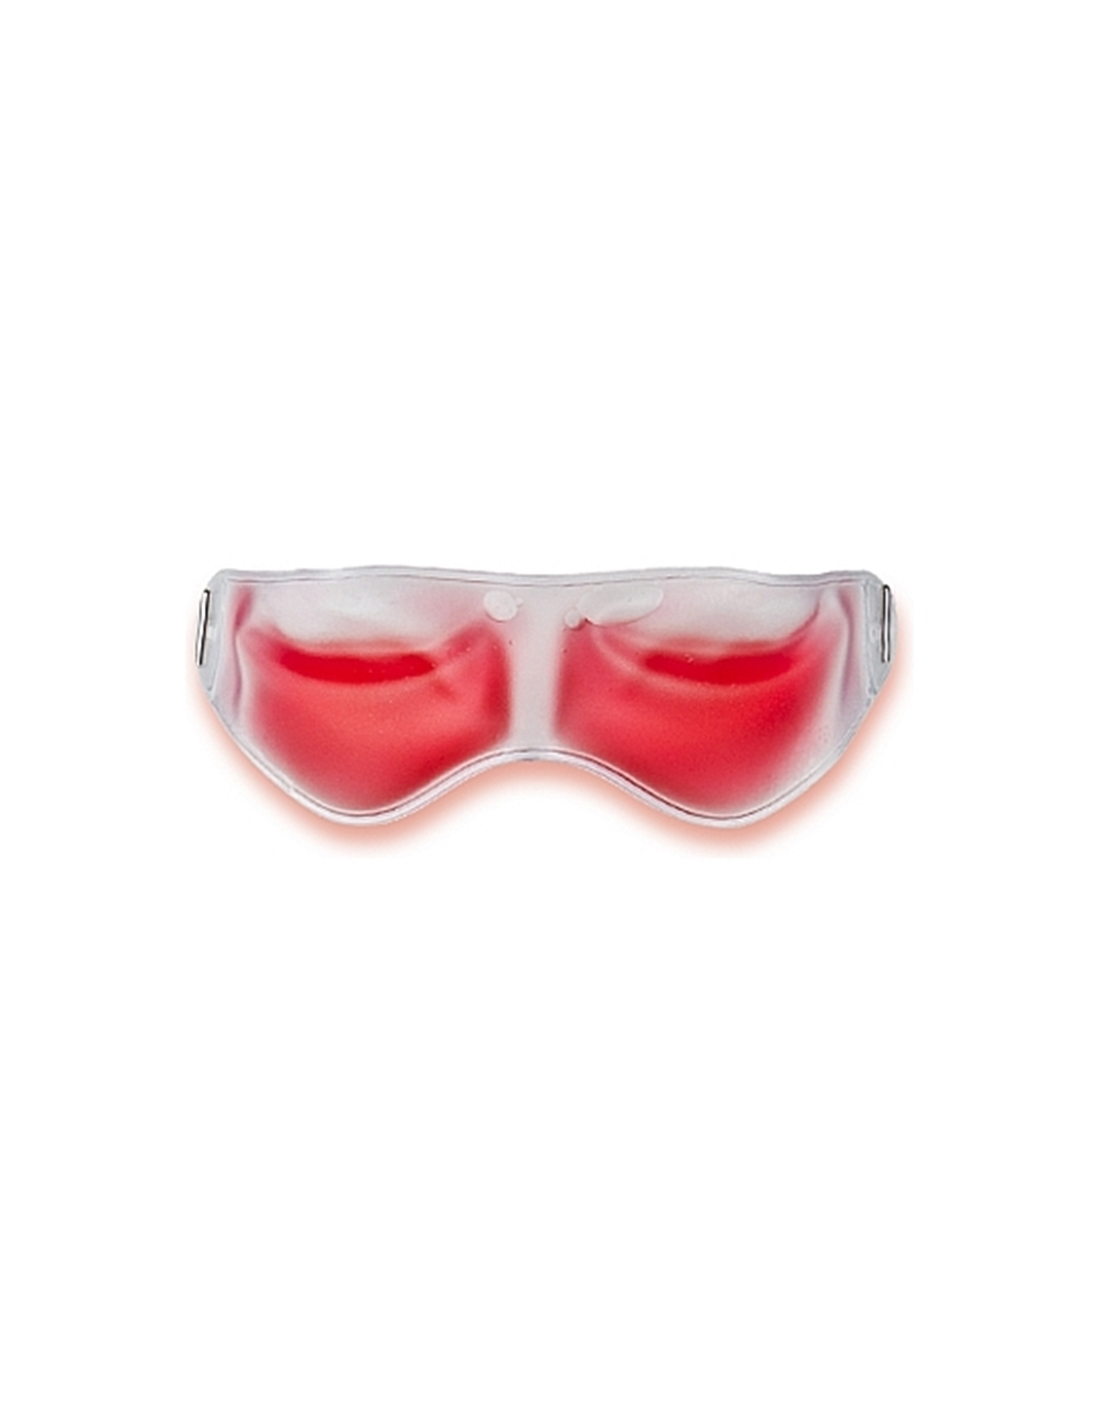 Máscara De Gel Gelmask Vermelha - PR2010314444